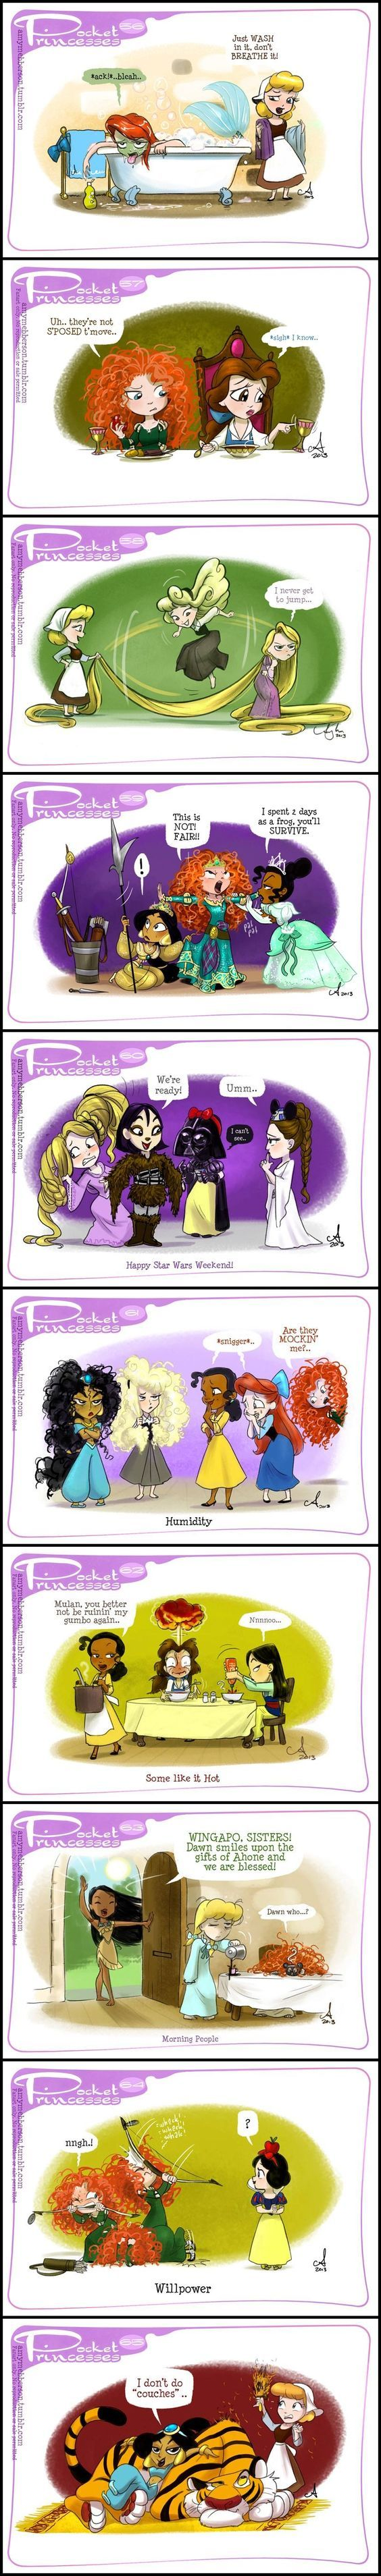 Pocket Princesses (Part 6) by Amy Mebberson: